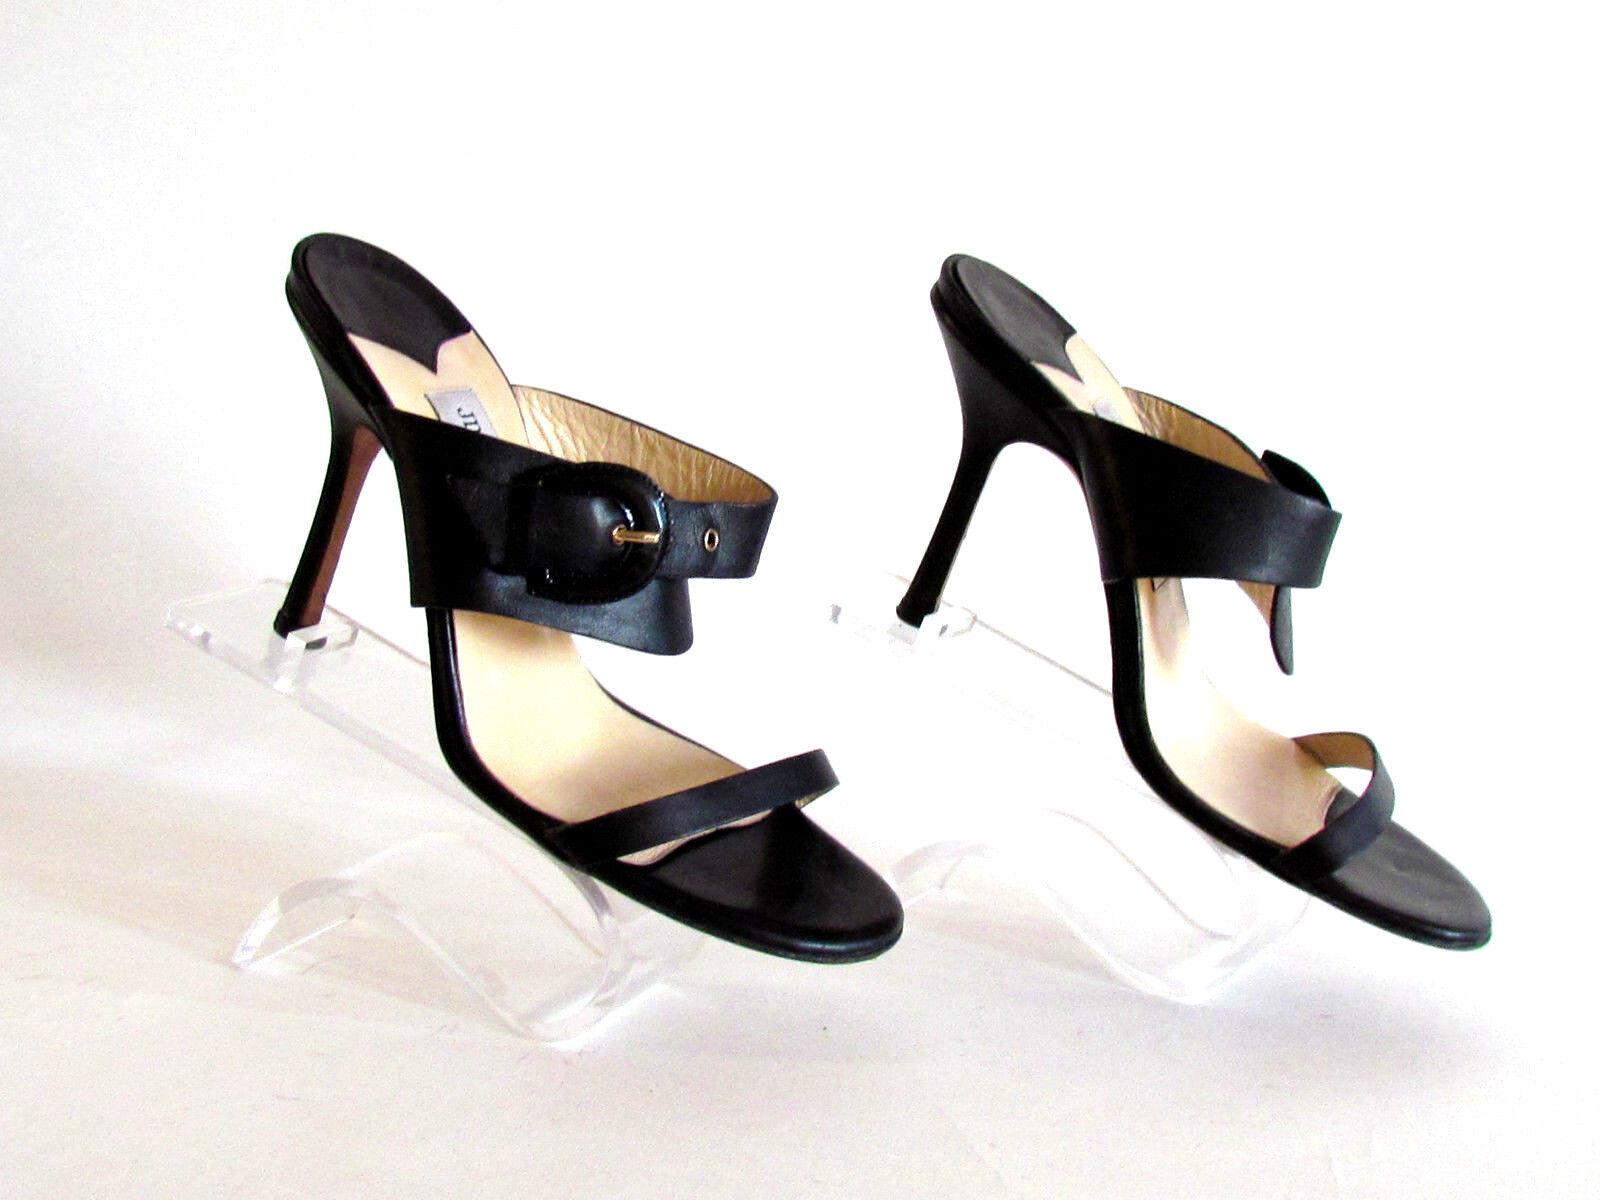 Mujer Zapatos Sandalias Tacones Diseño Jimmy Choo Negro Piel Sandalias 8.5M